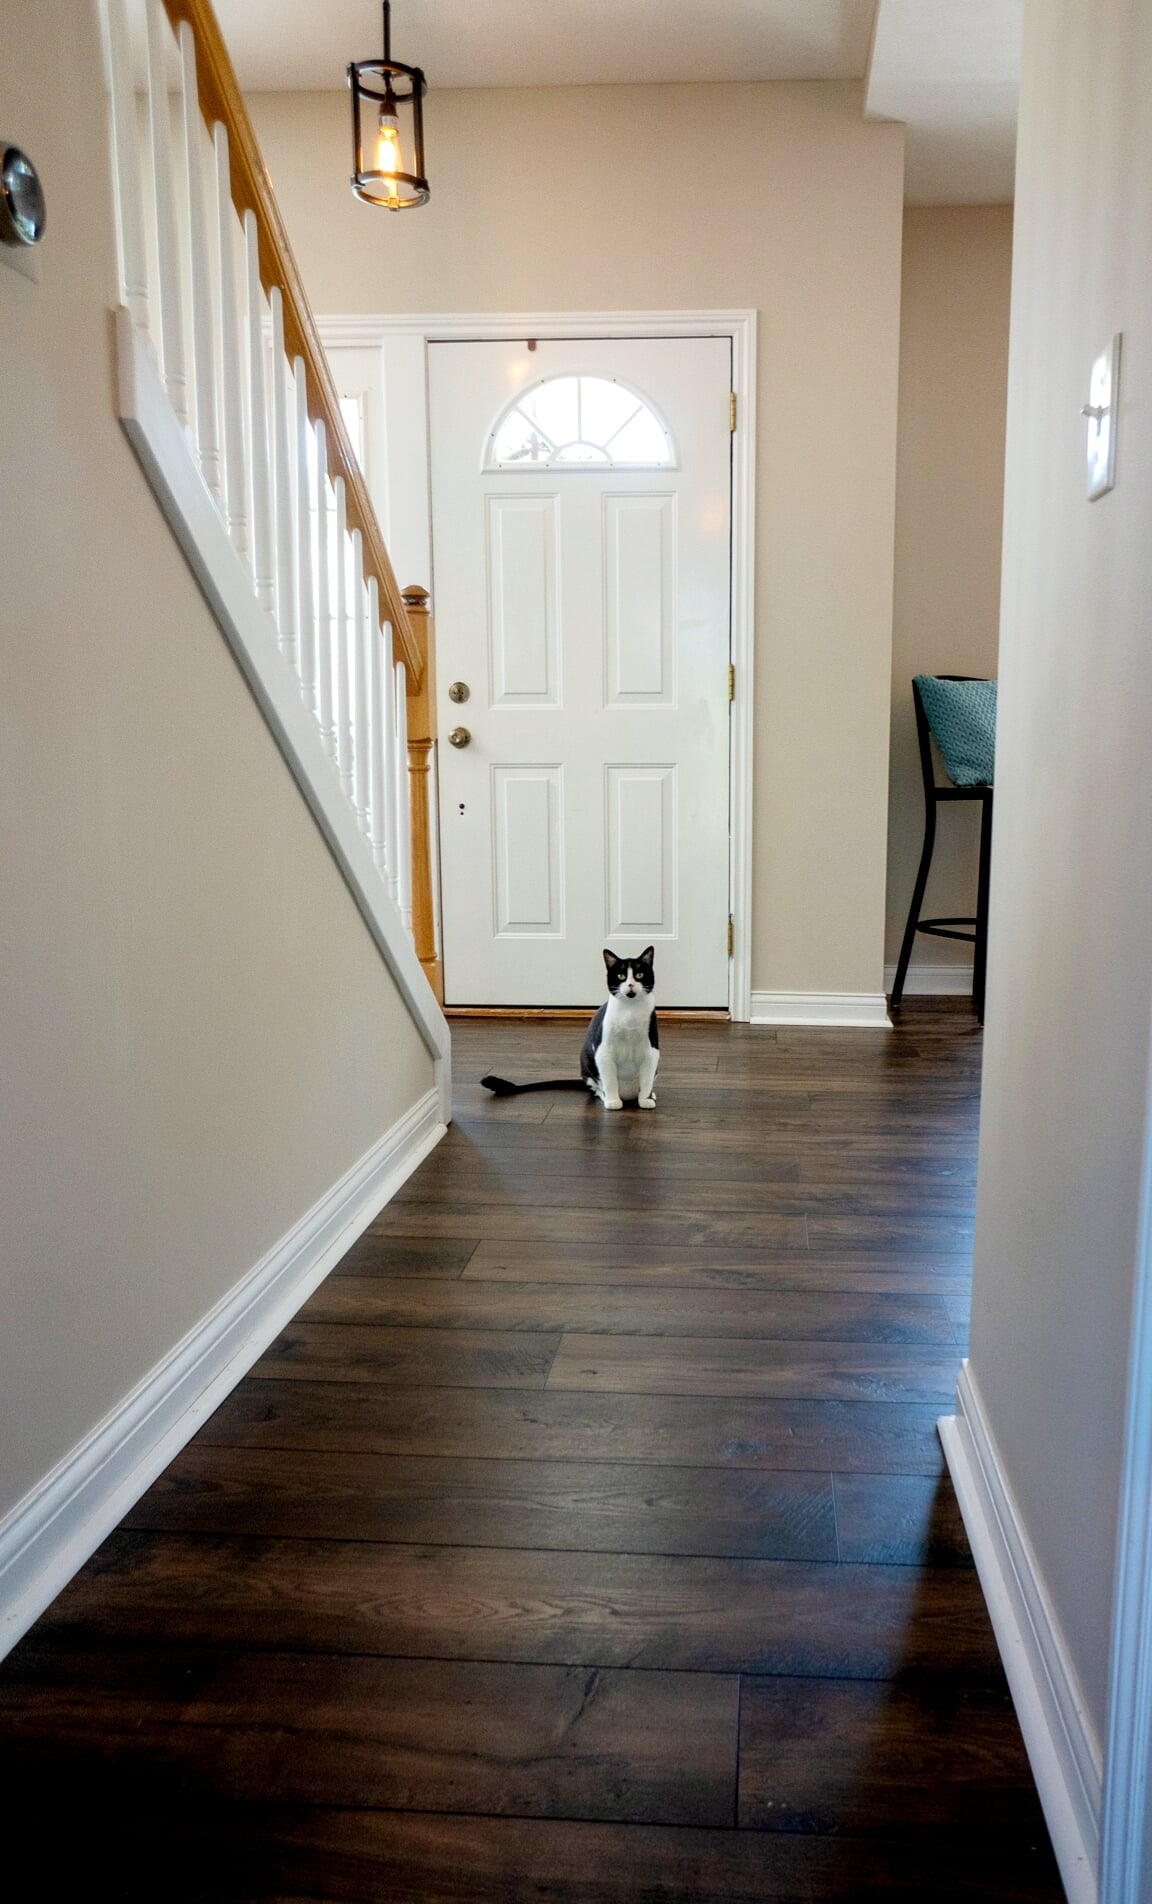 Pet-friendly flooring in Lansing, MI from Absolute Floor Covering